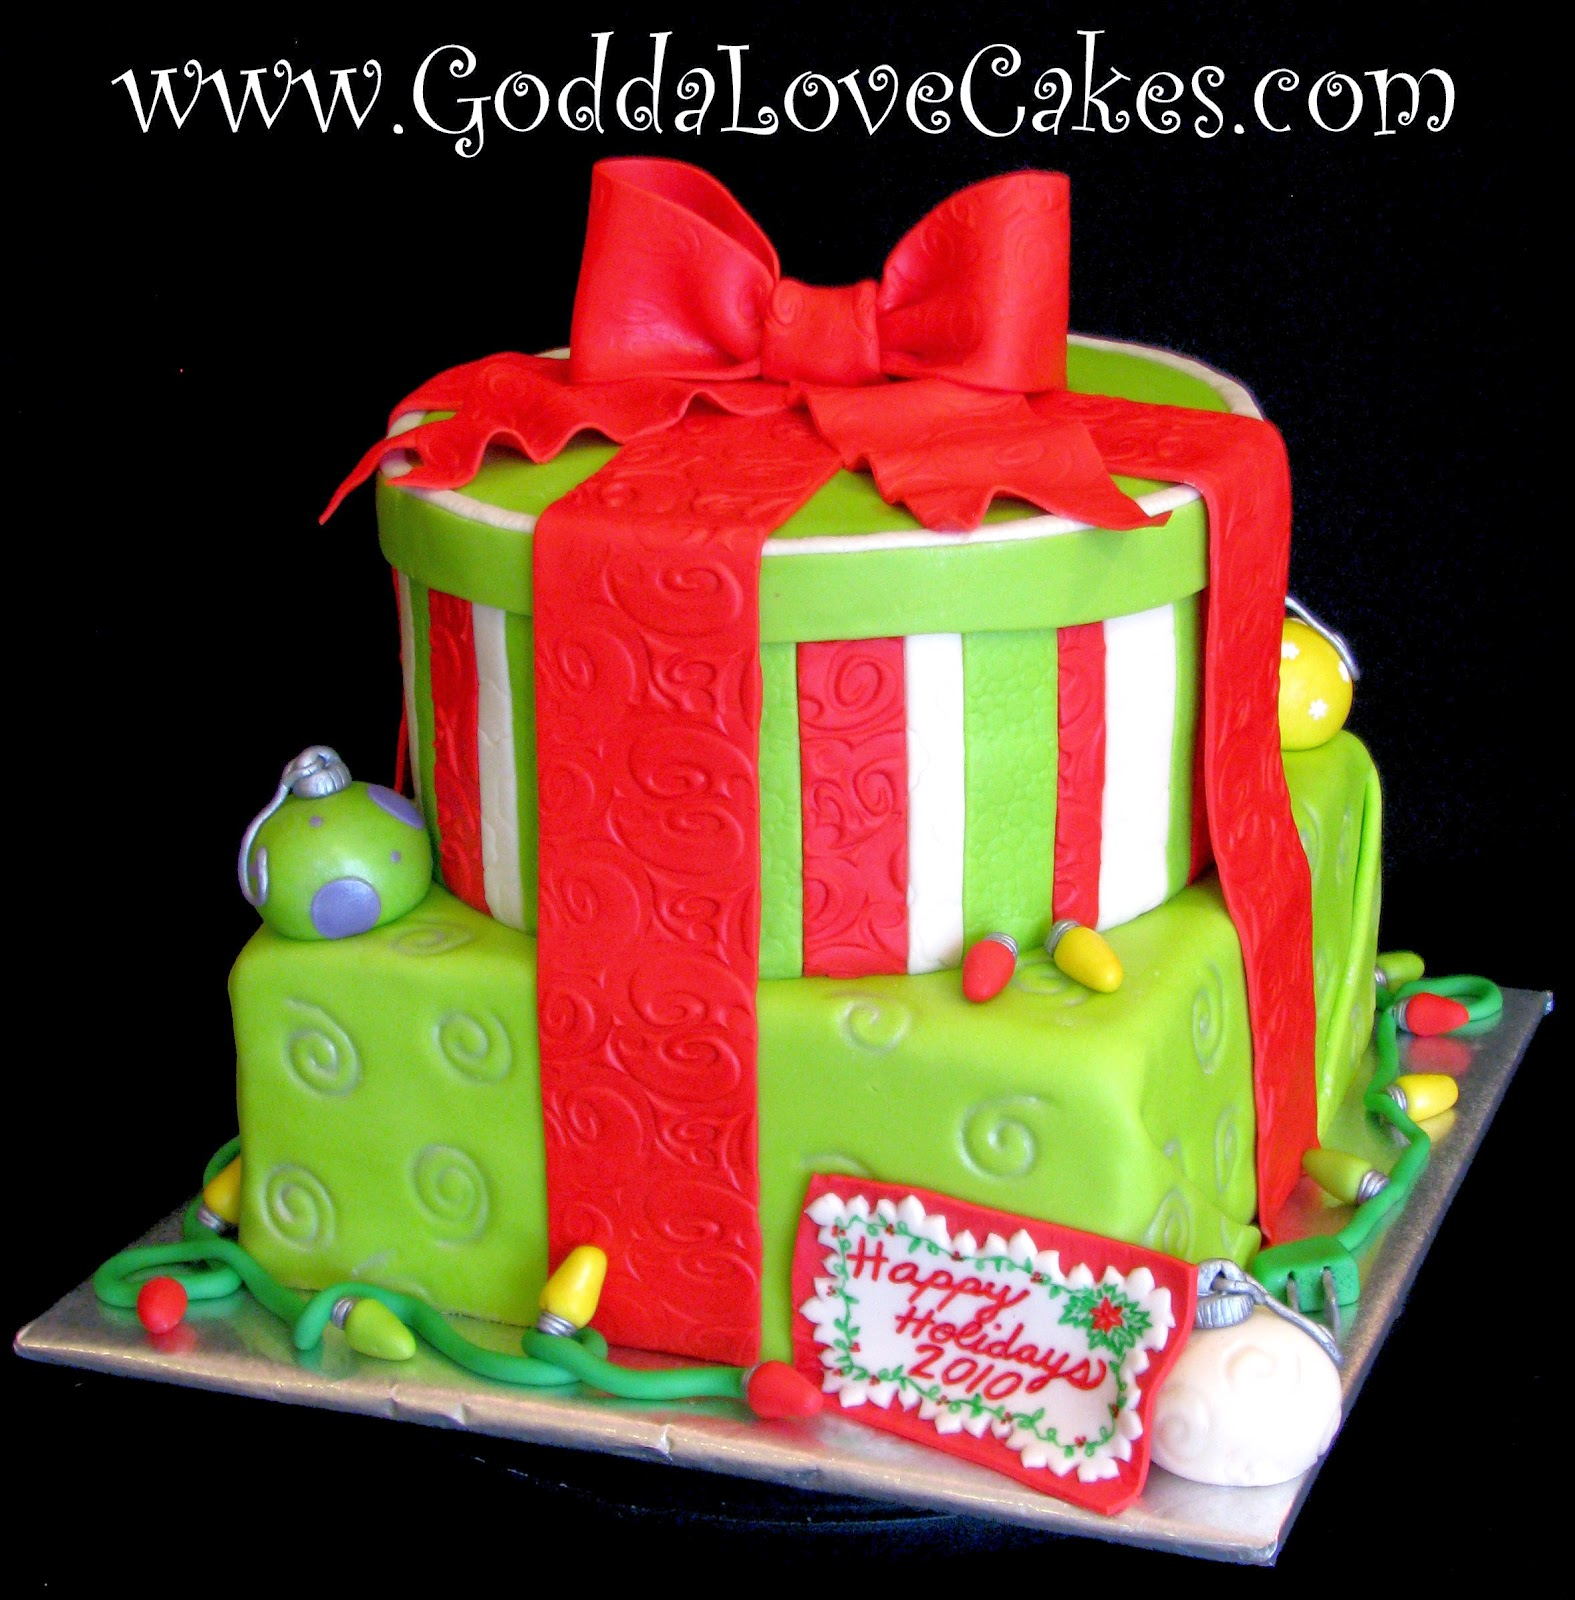 Christmas Present Cake Godda Love Cakes